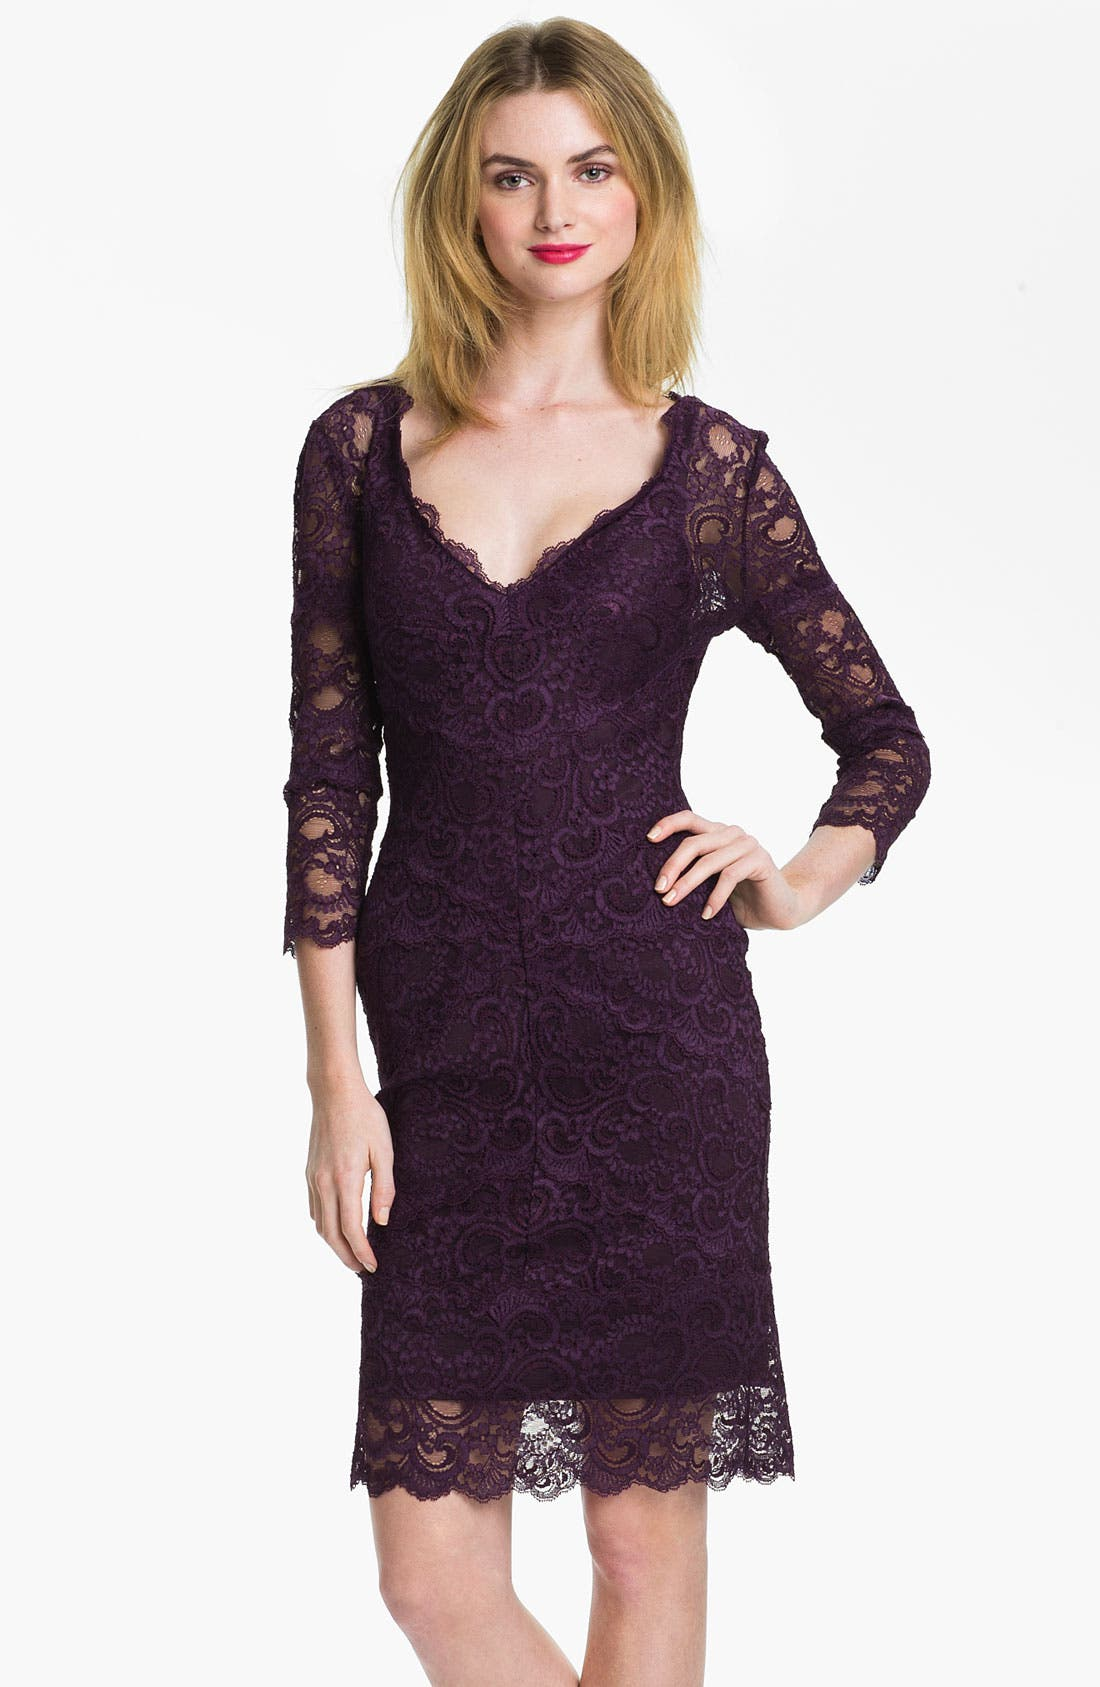 Alternate Image 1 Selected - Nicole Miller Illusion Sleeve Lace Overlay Sheath Dress